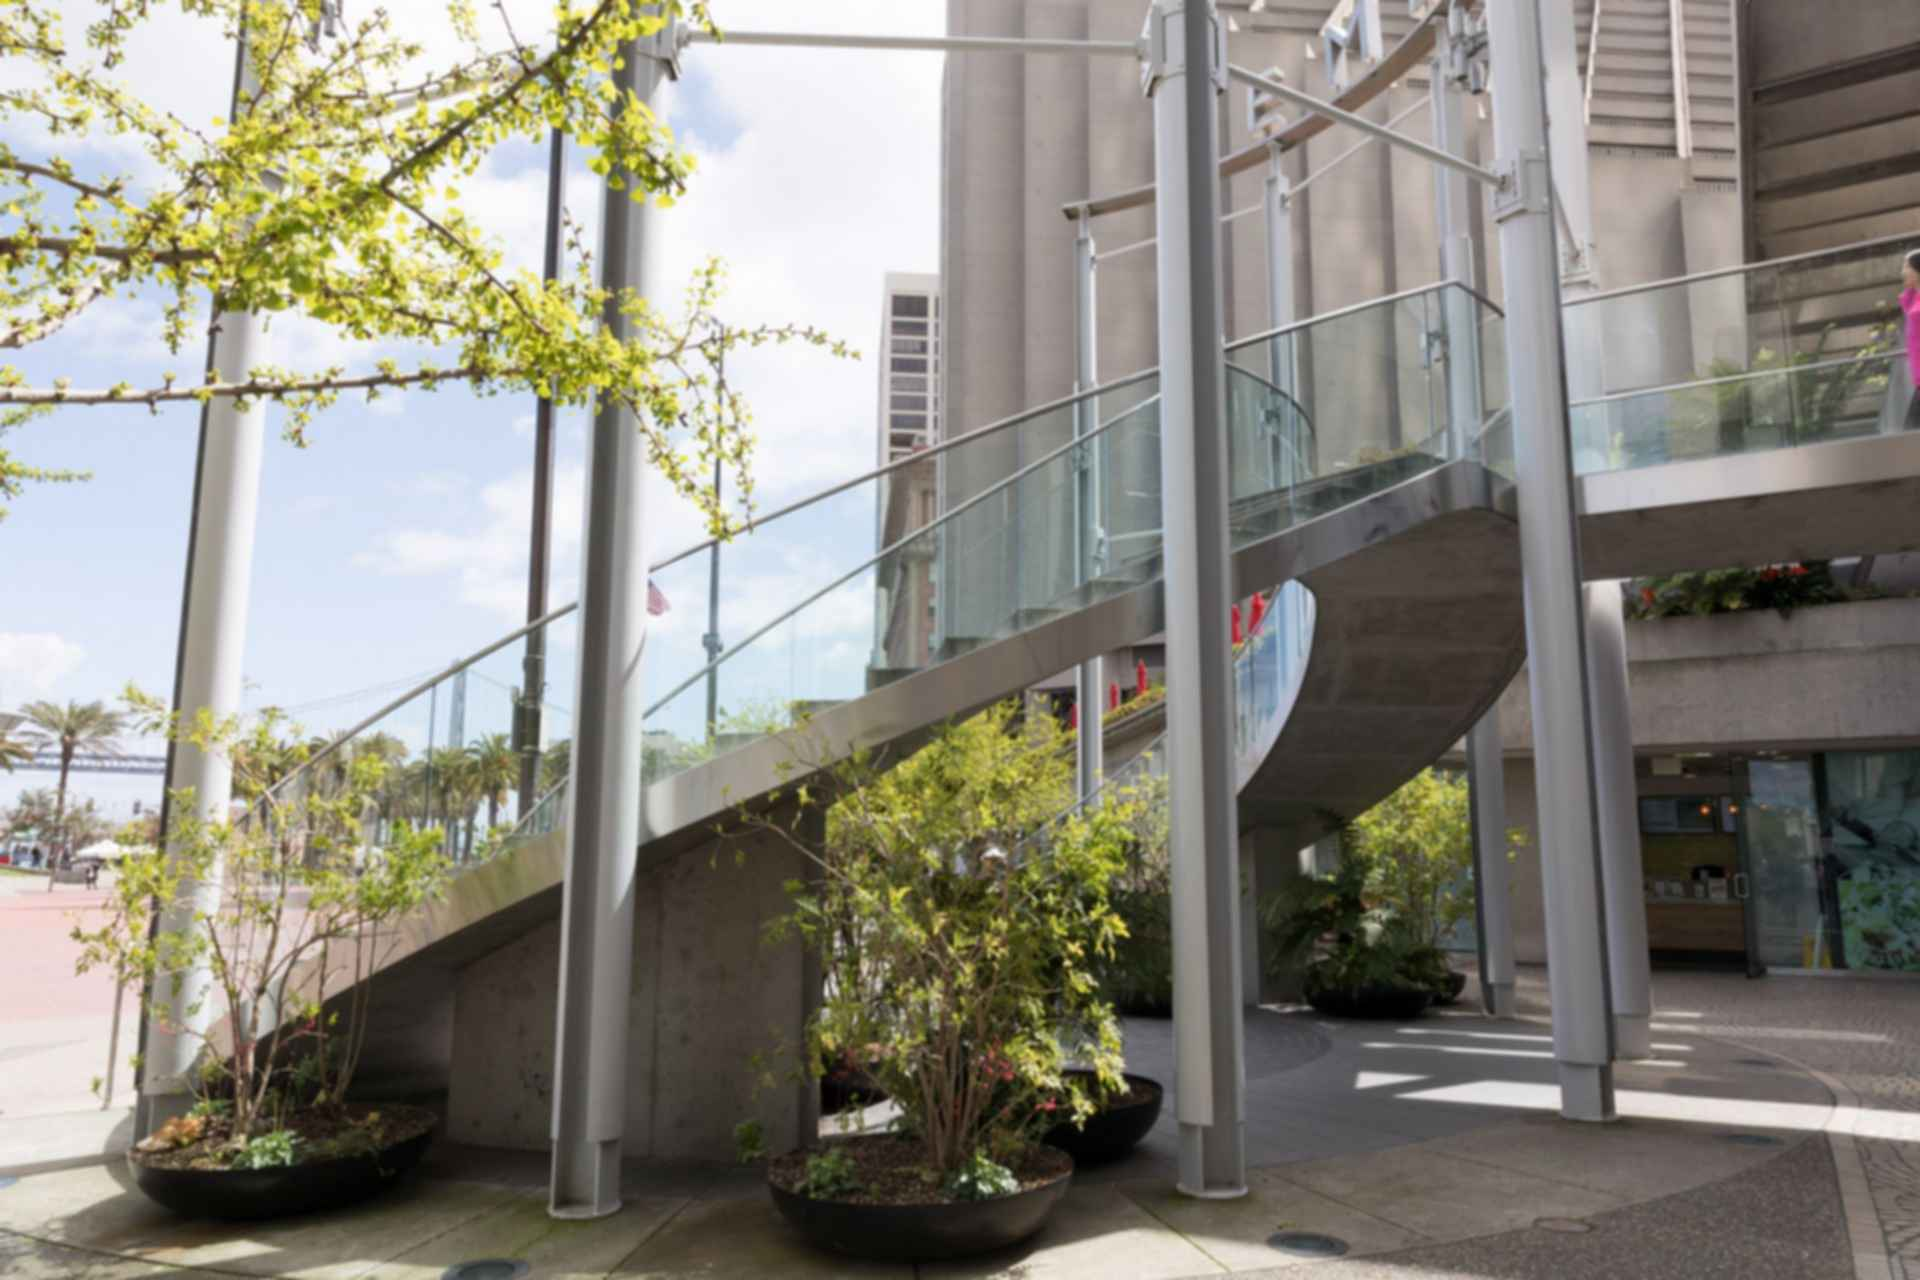 Embarcadero Center Outdoor Stairway Entrance